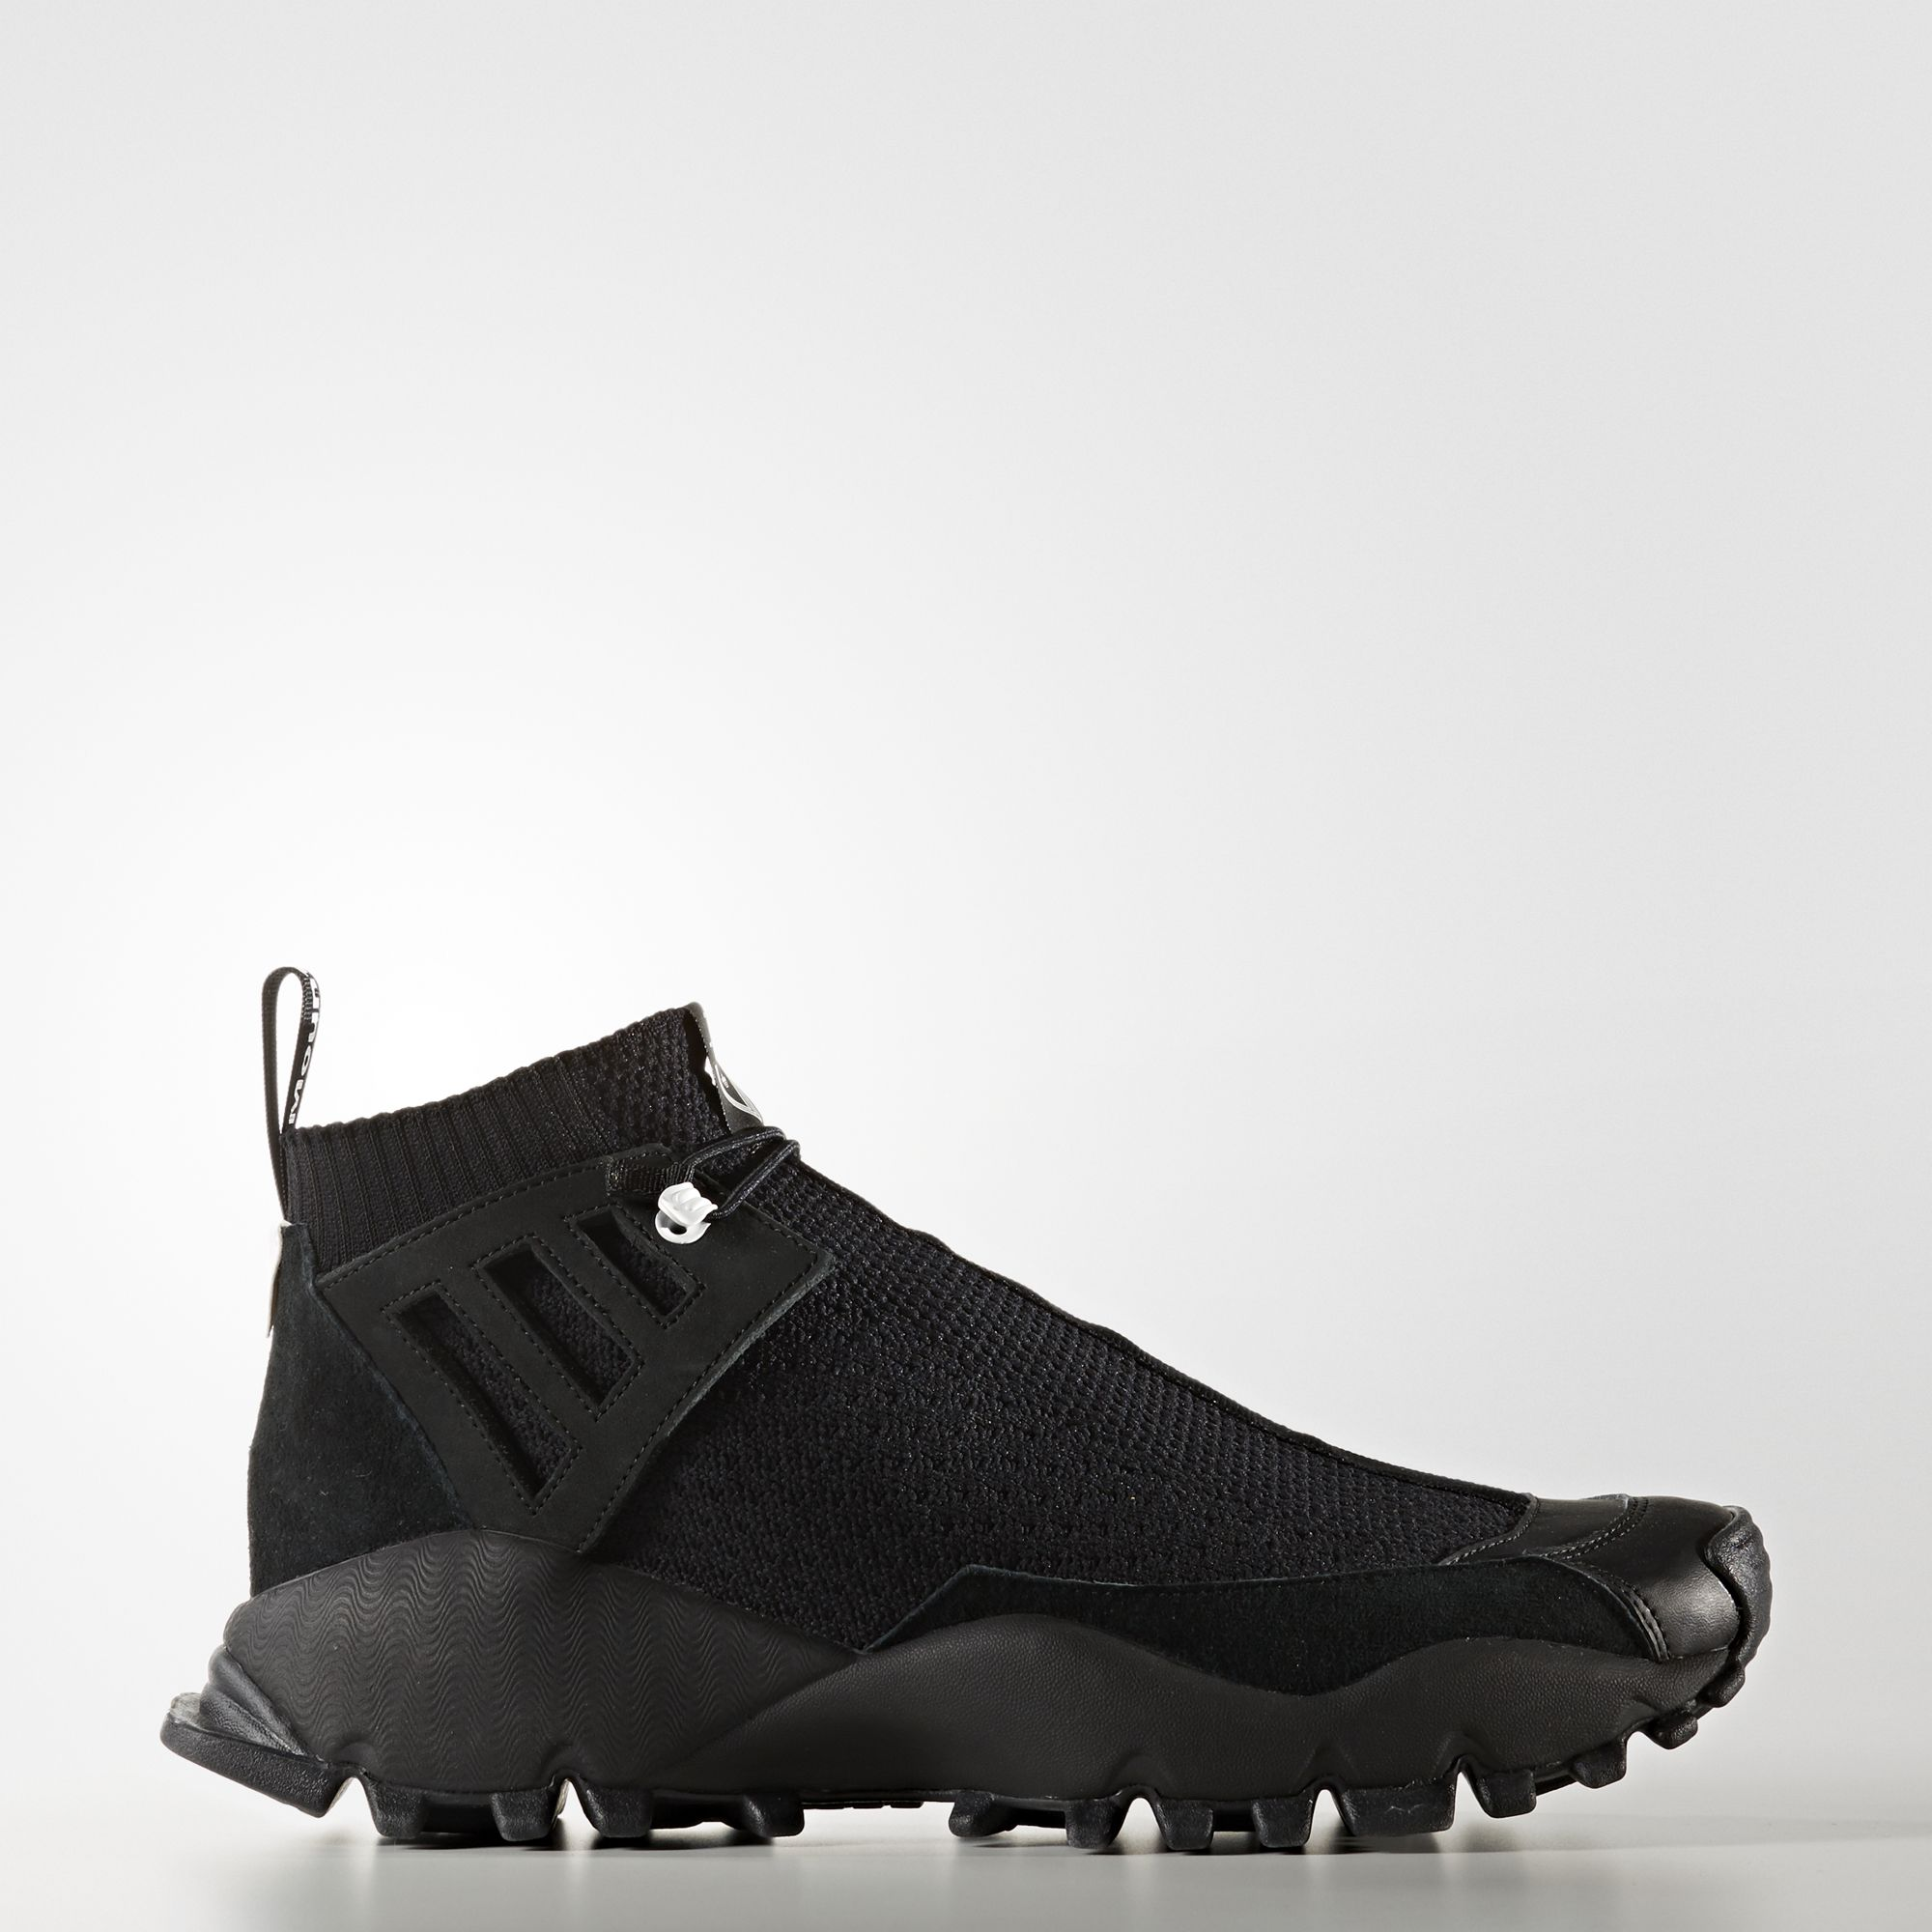 adidas Originals x White Mountaineering